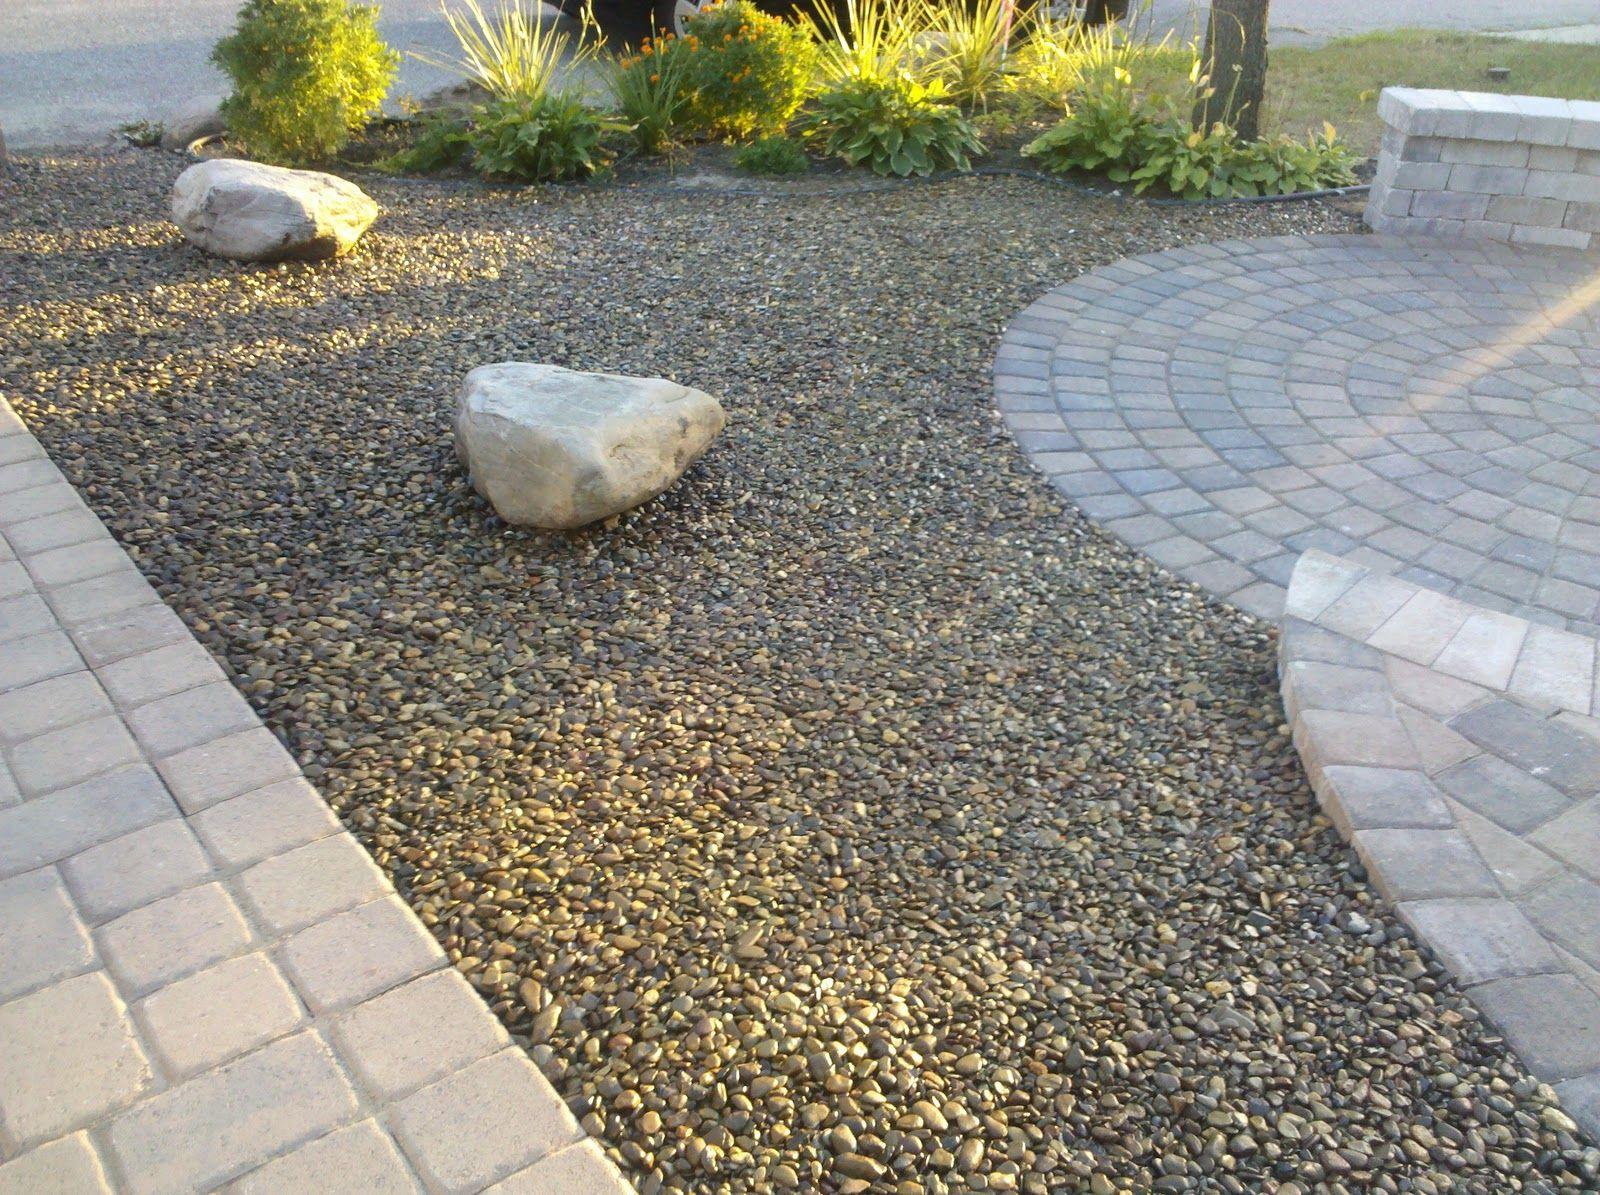 gravel landscaping review ideas for using gravel for landscaping